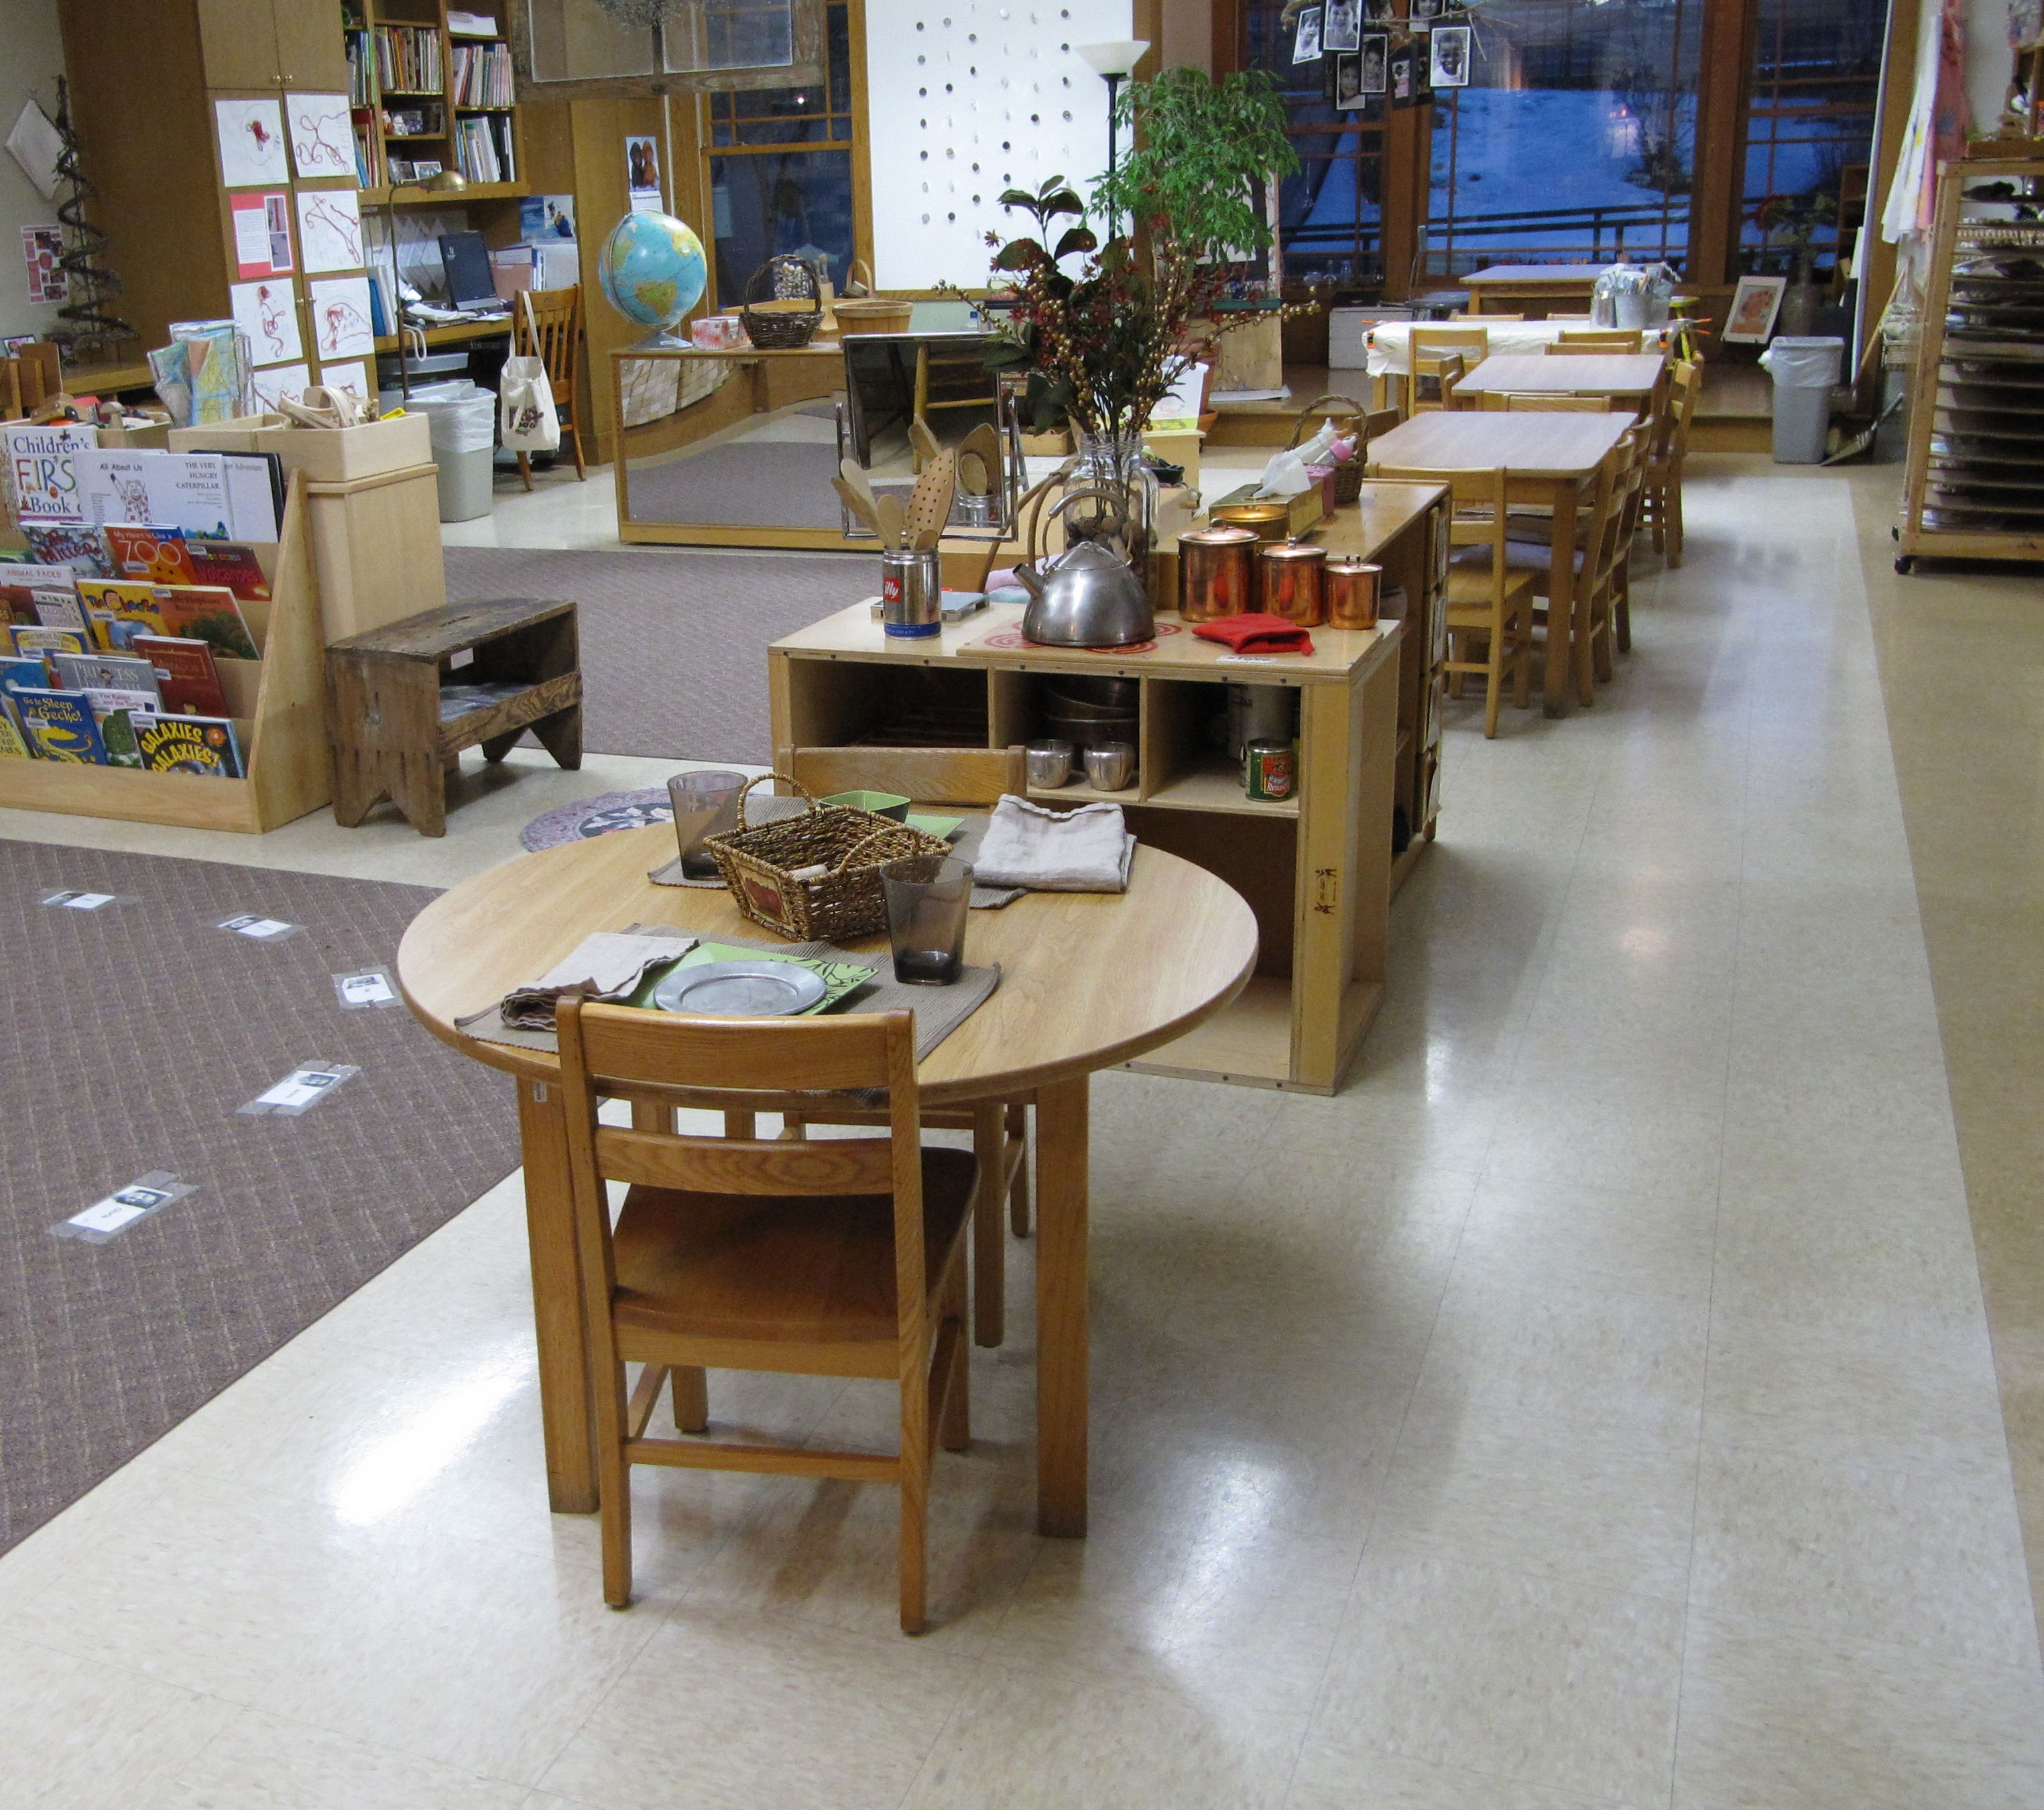 Classroom Design Overview ~ Pre k class overview daycare environment pinterest